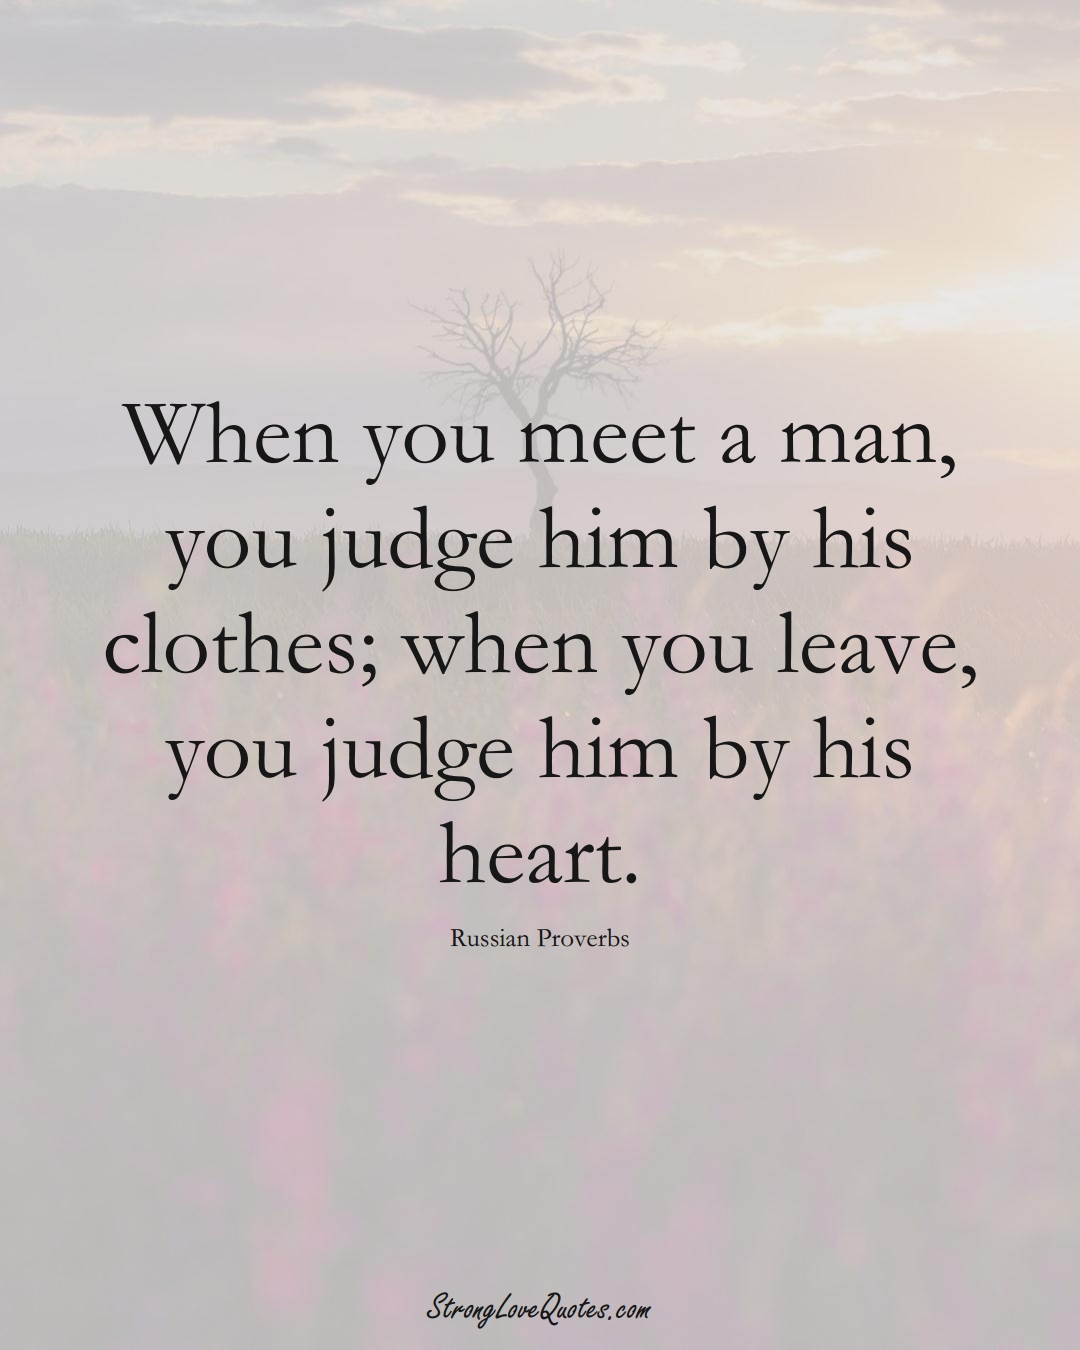 When you meet a man, you judge him by his clothes; when you leave, you judge him by his heart. (Russian Sayings);  #AsianSayings